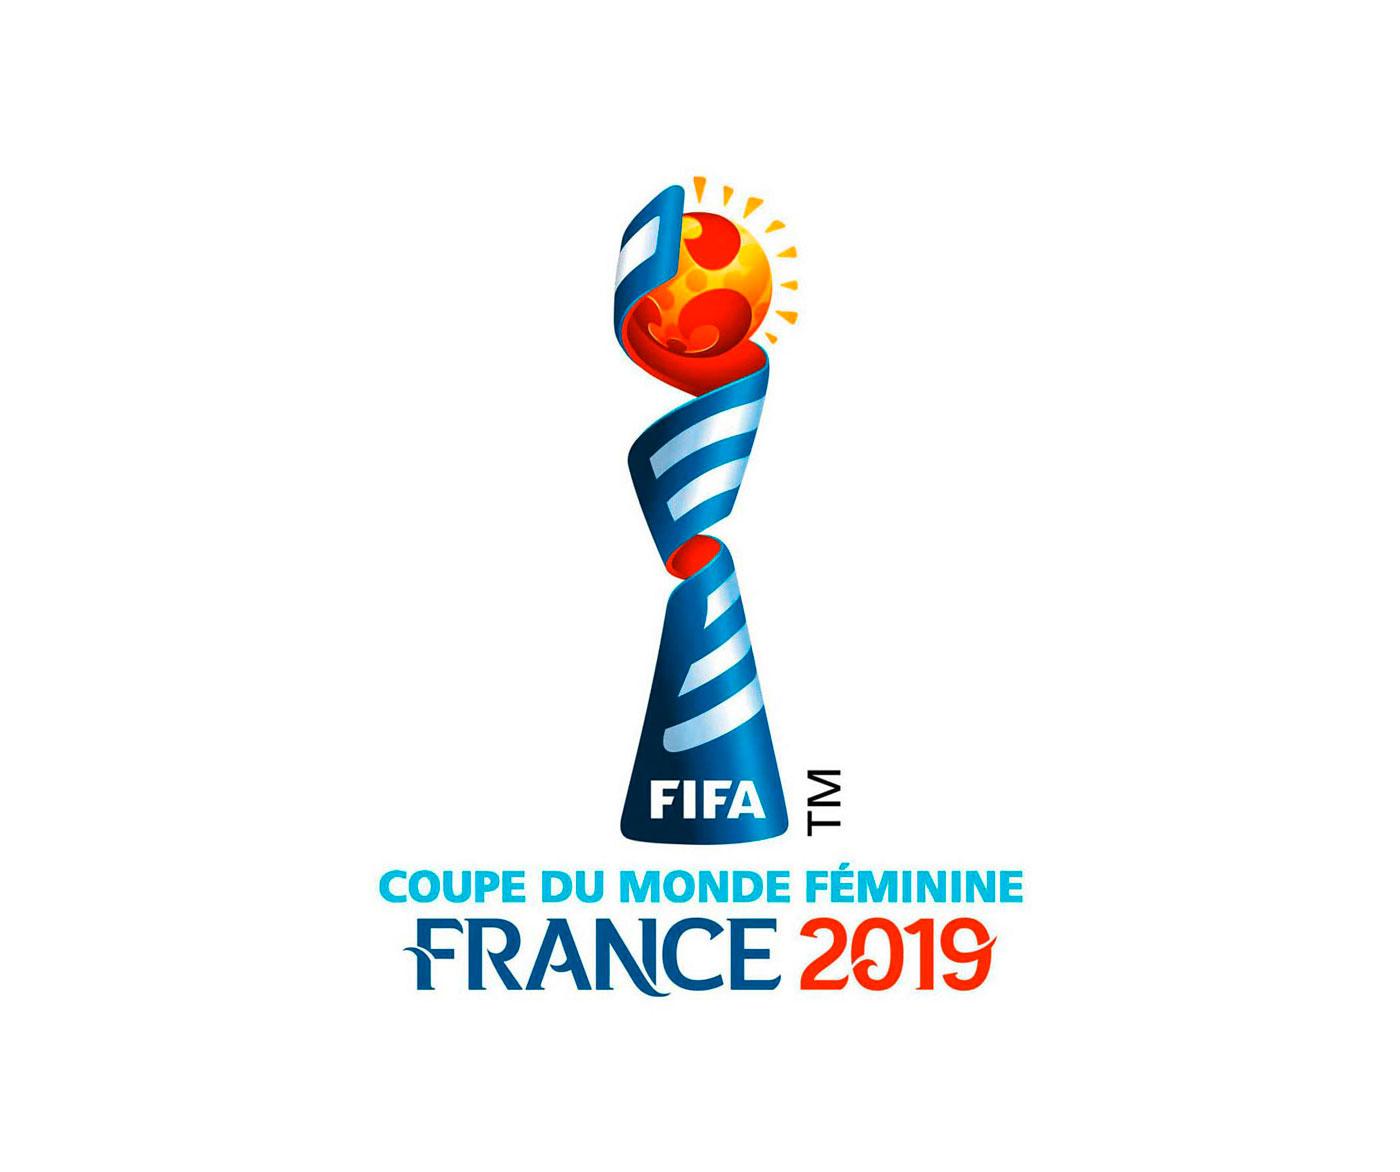 Coupe du monde féminine de football FIFA™, France 2019